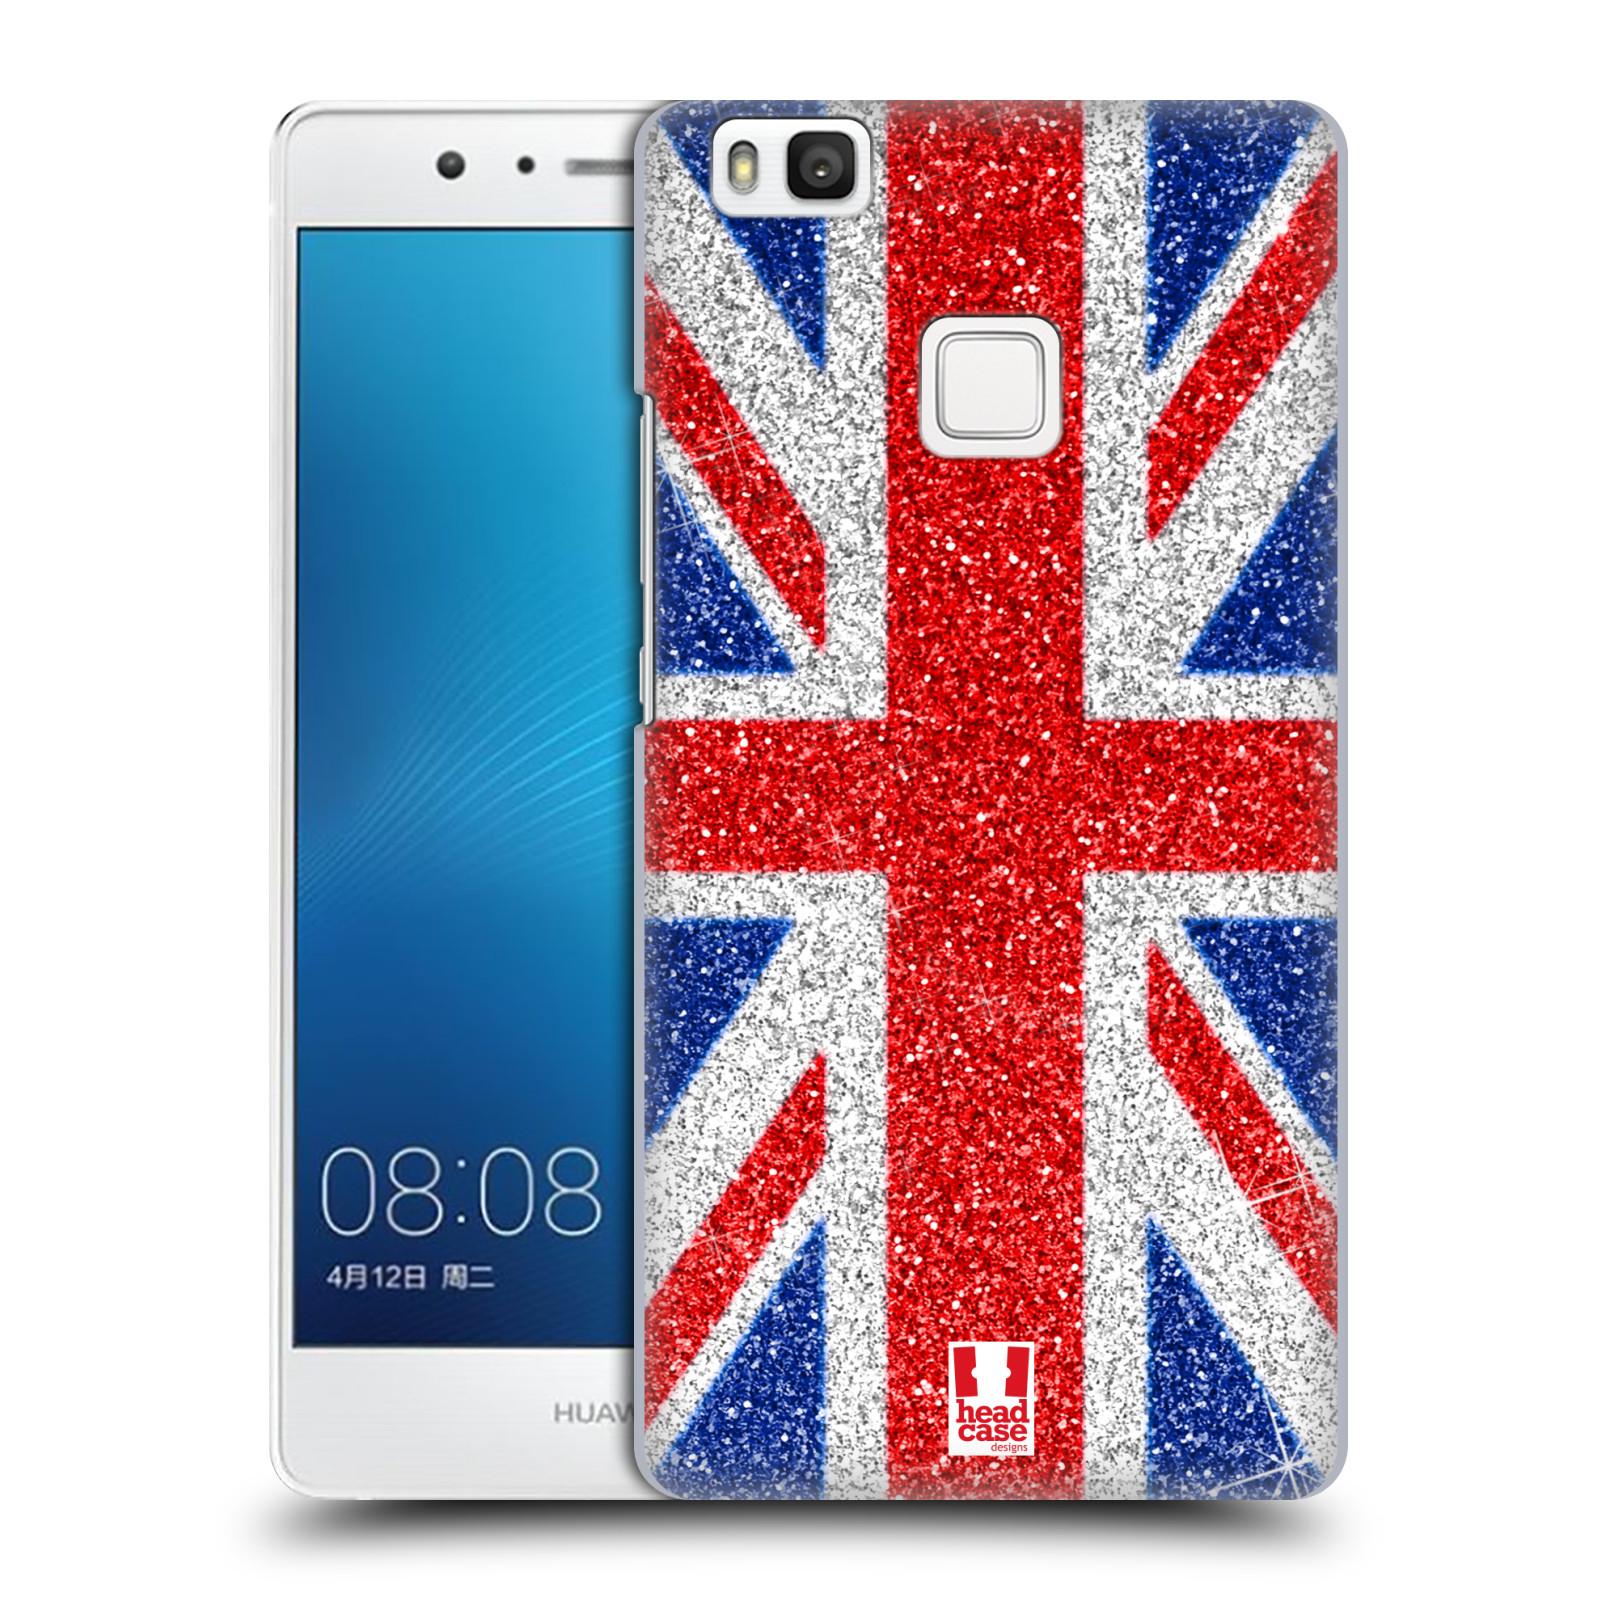 Plastové pouzdro na mobil Huawei P9 Lite HEAD CASE UNION GLITTER